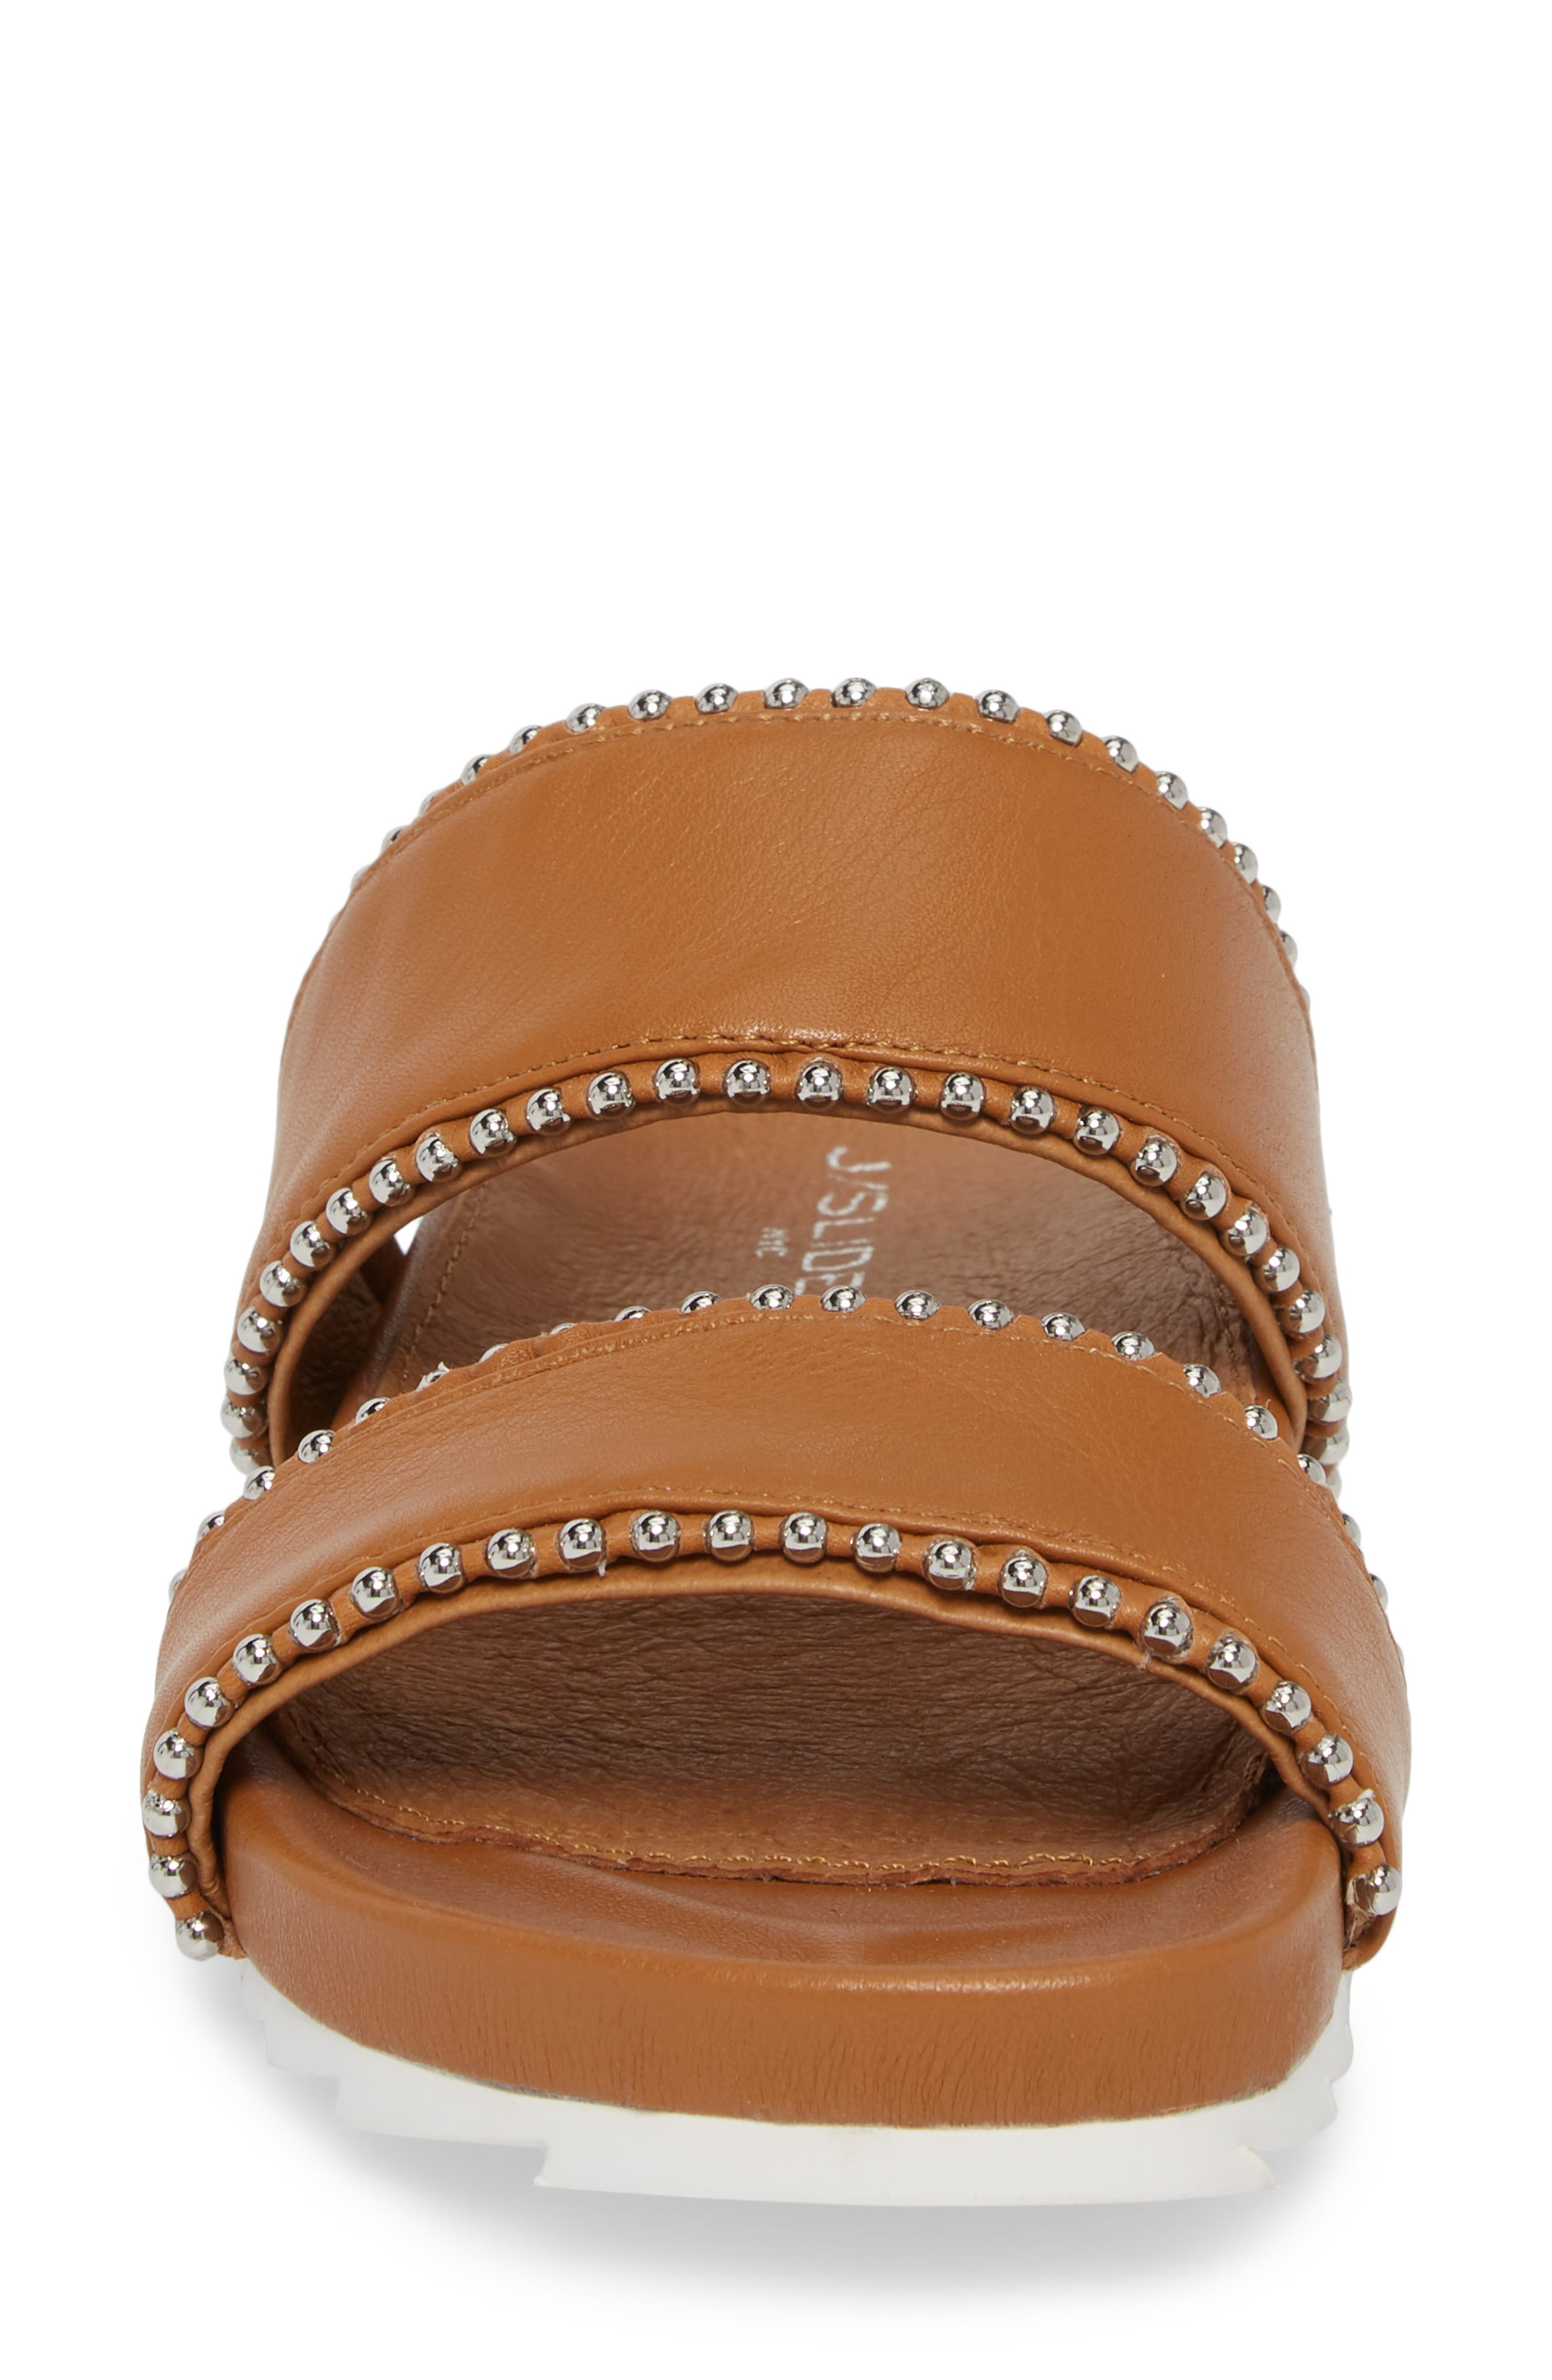 Emmie Bead Chain Slide Sandal,                             Alternate thumbnail 4, color,                             TAN LEATHER